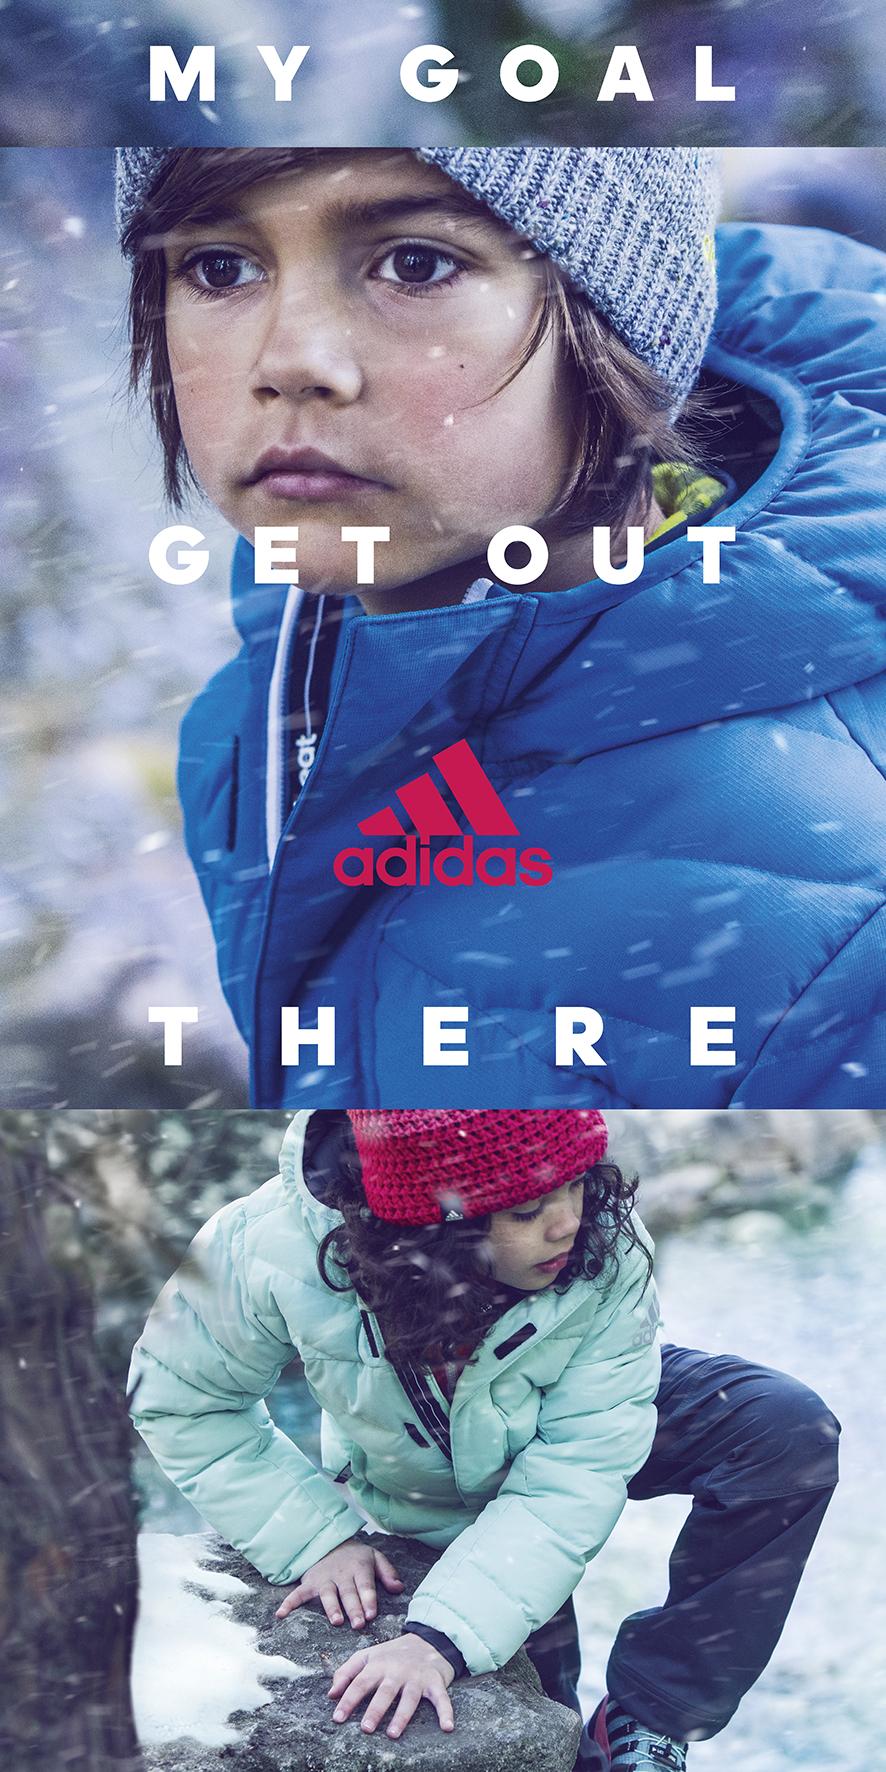 adidas_YoungAthletes_FW16_Outdoor_1000x2000.jpg